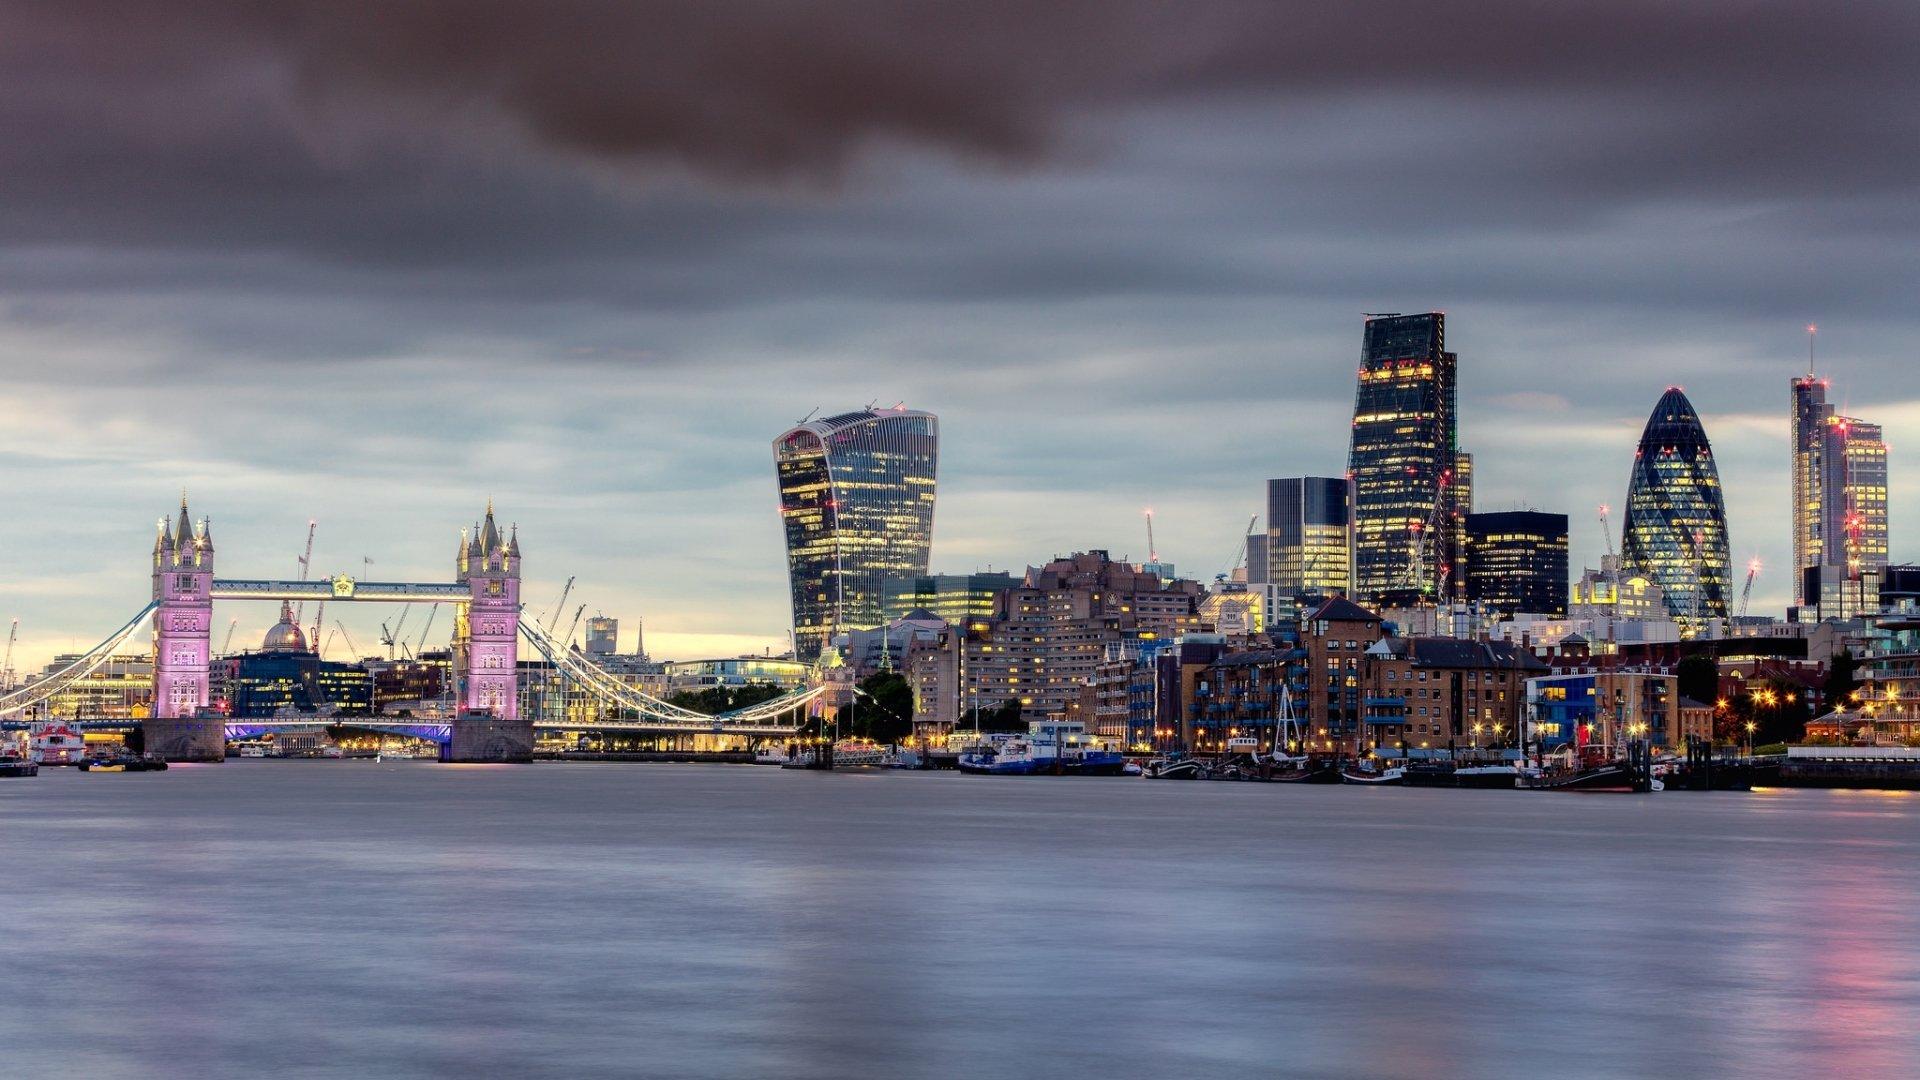 Man Made - London  City Tower Bridge United Kingdom Thames Night Building Skyscraper Wallpaper